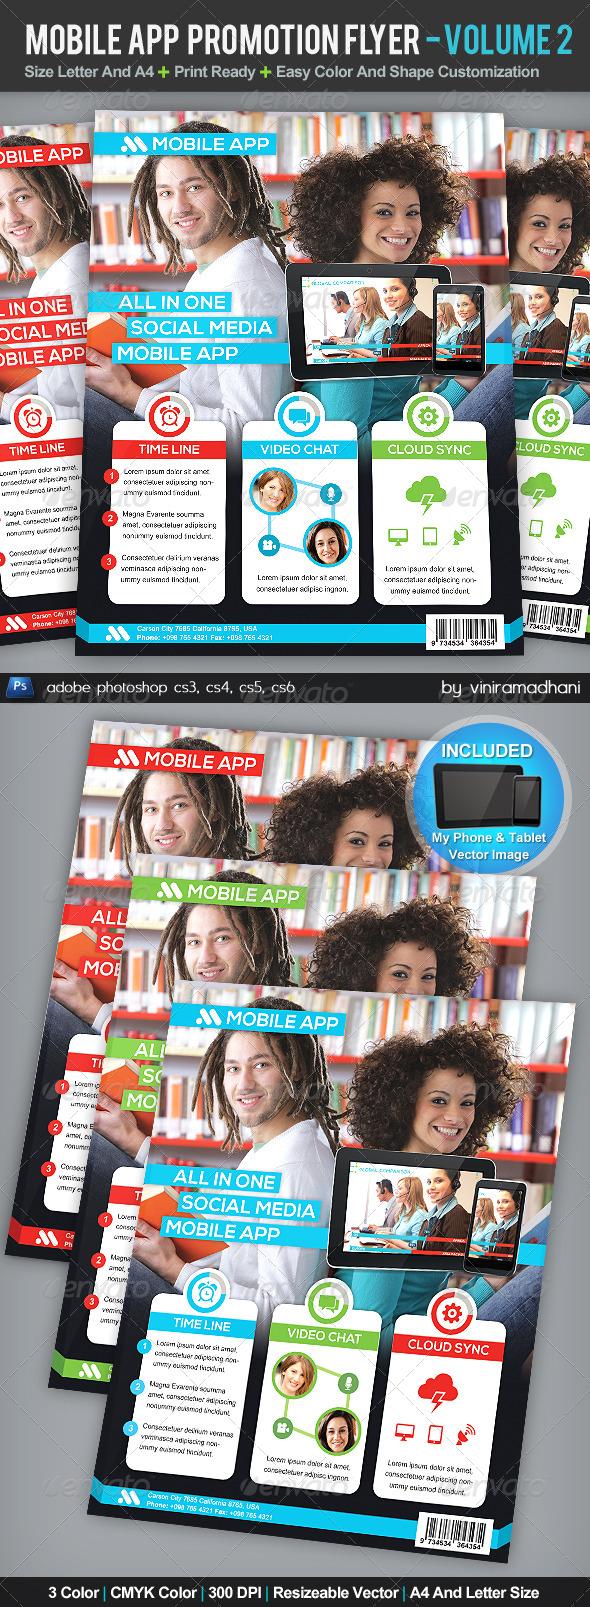 GraphicRiver Mobile App Promotion Flyer Volume 2 5212304